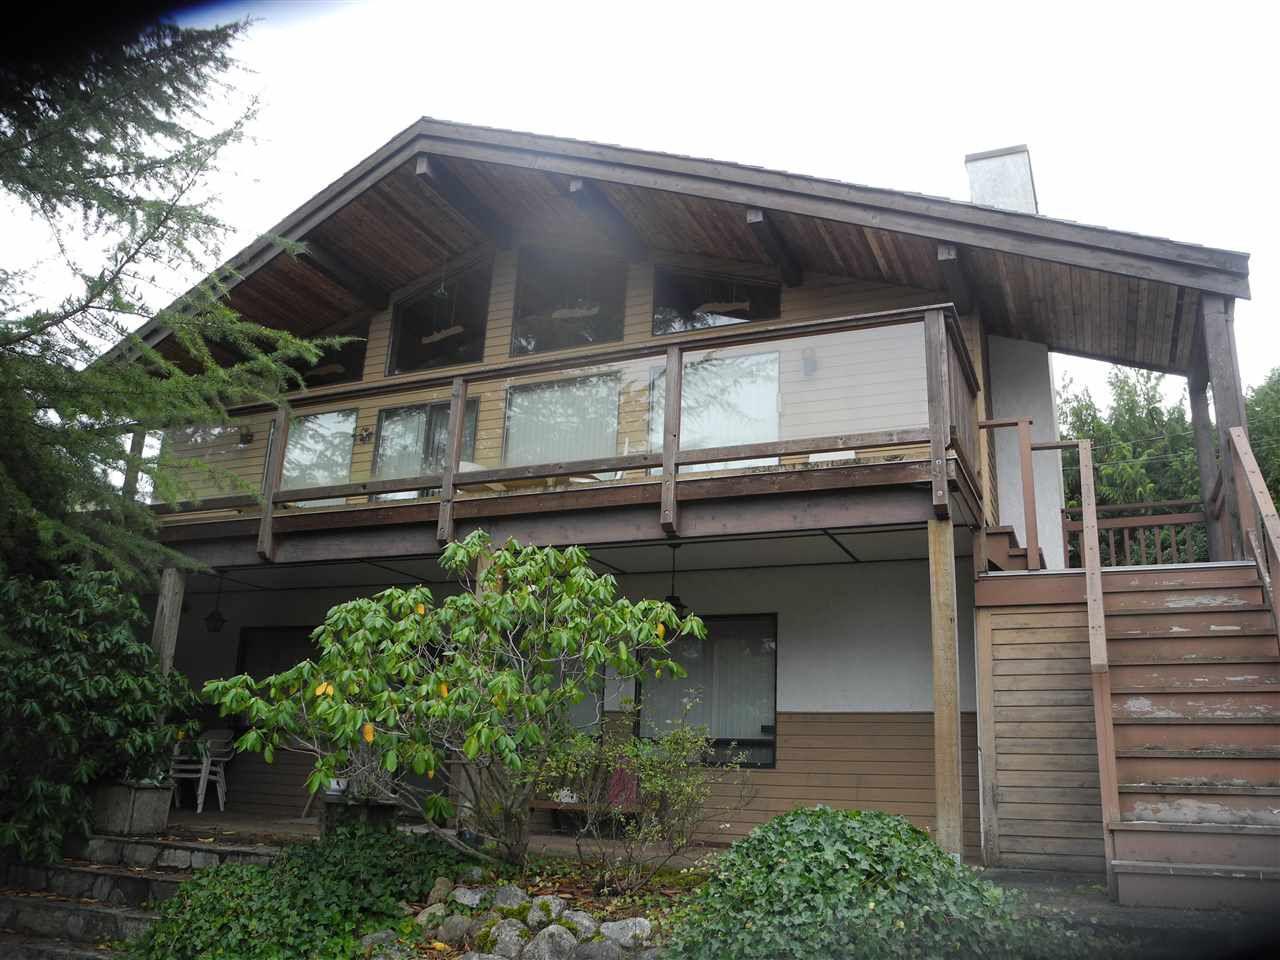 Main Photo: 6154 LOOKOUT Avenue in Sechelt: Sechelt District House for sale (Sunshine Coast)  : MLS®# R2241281